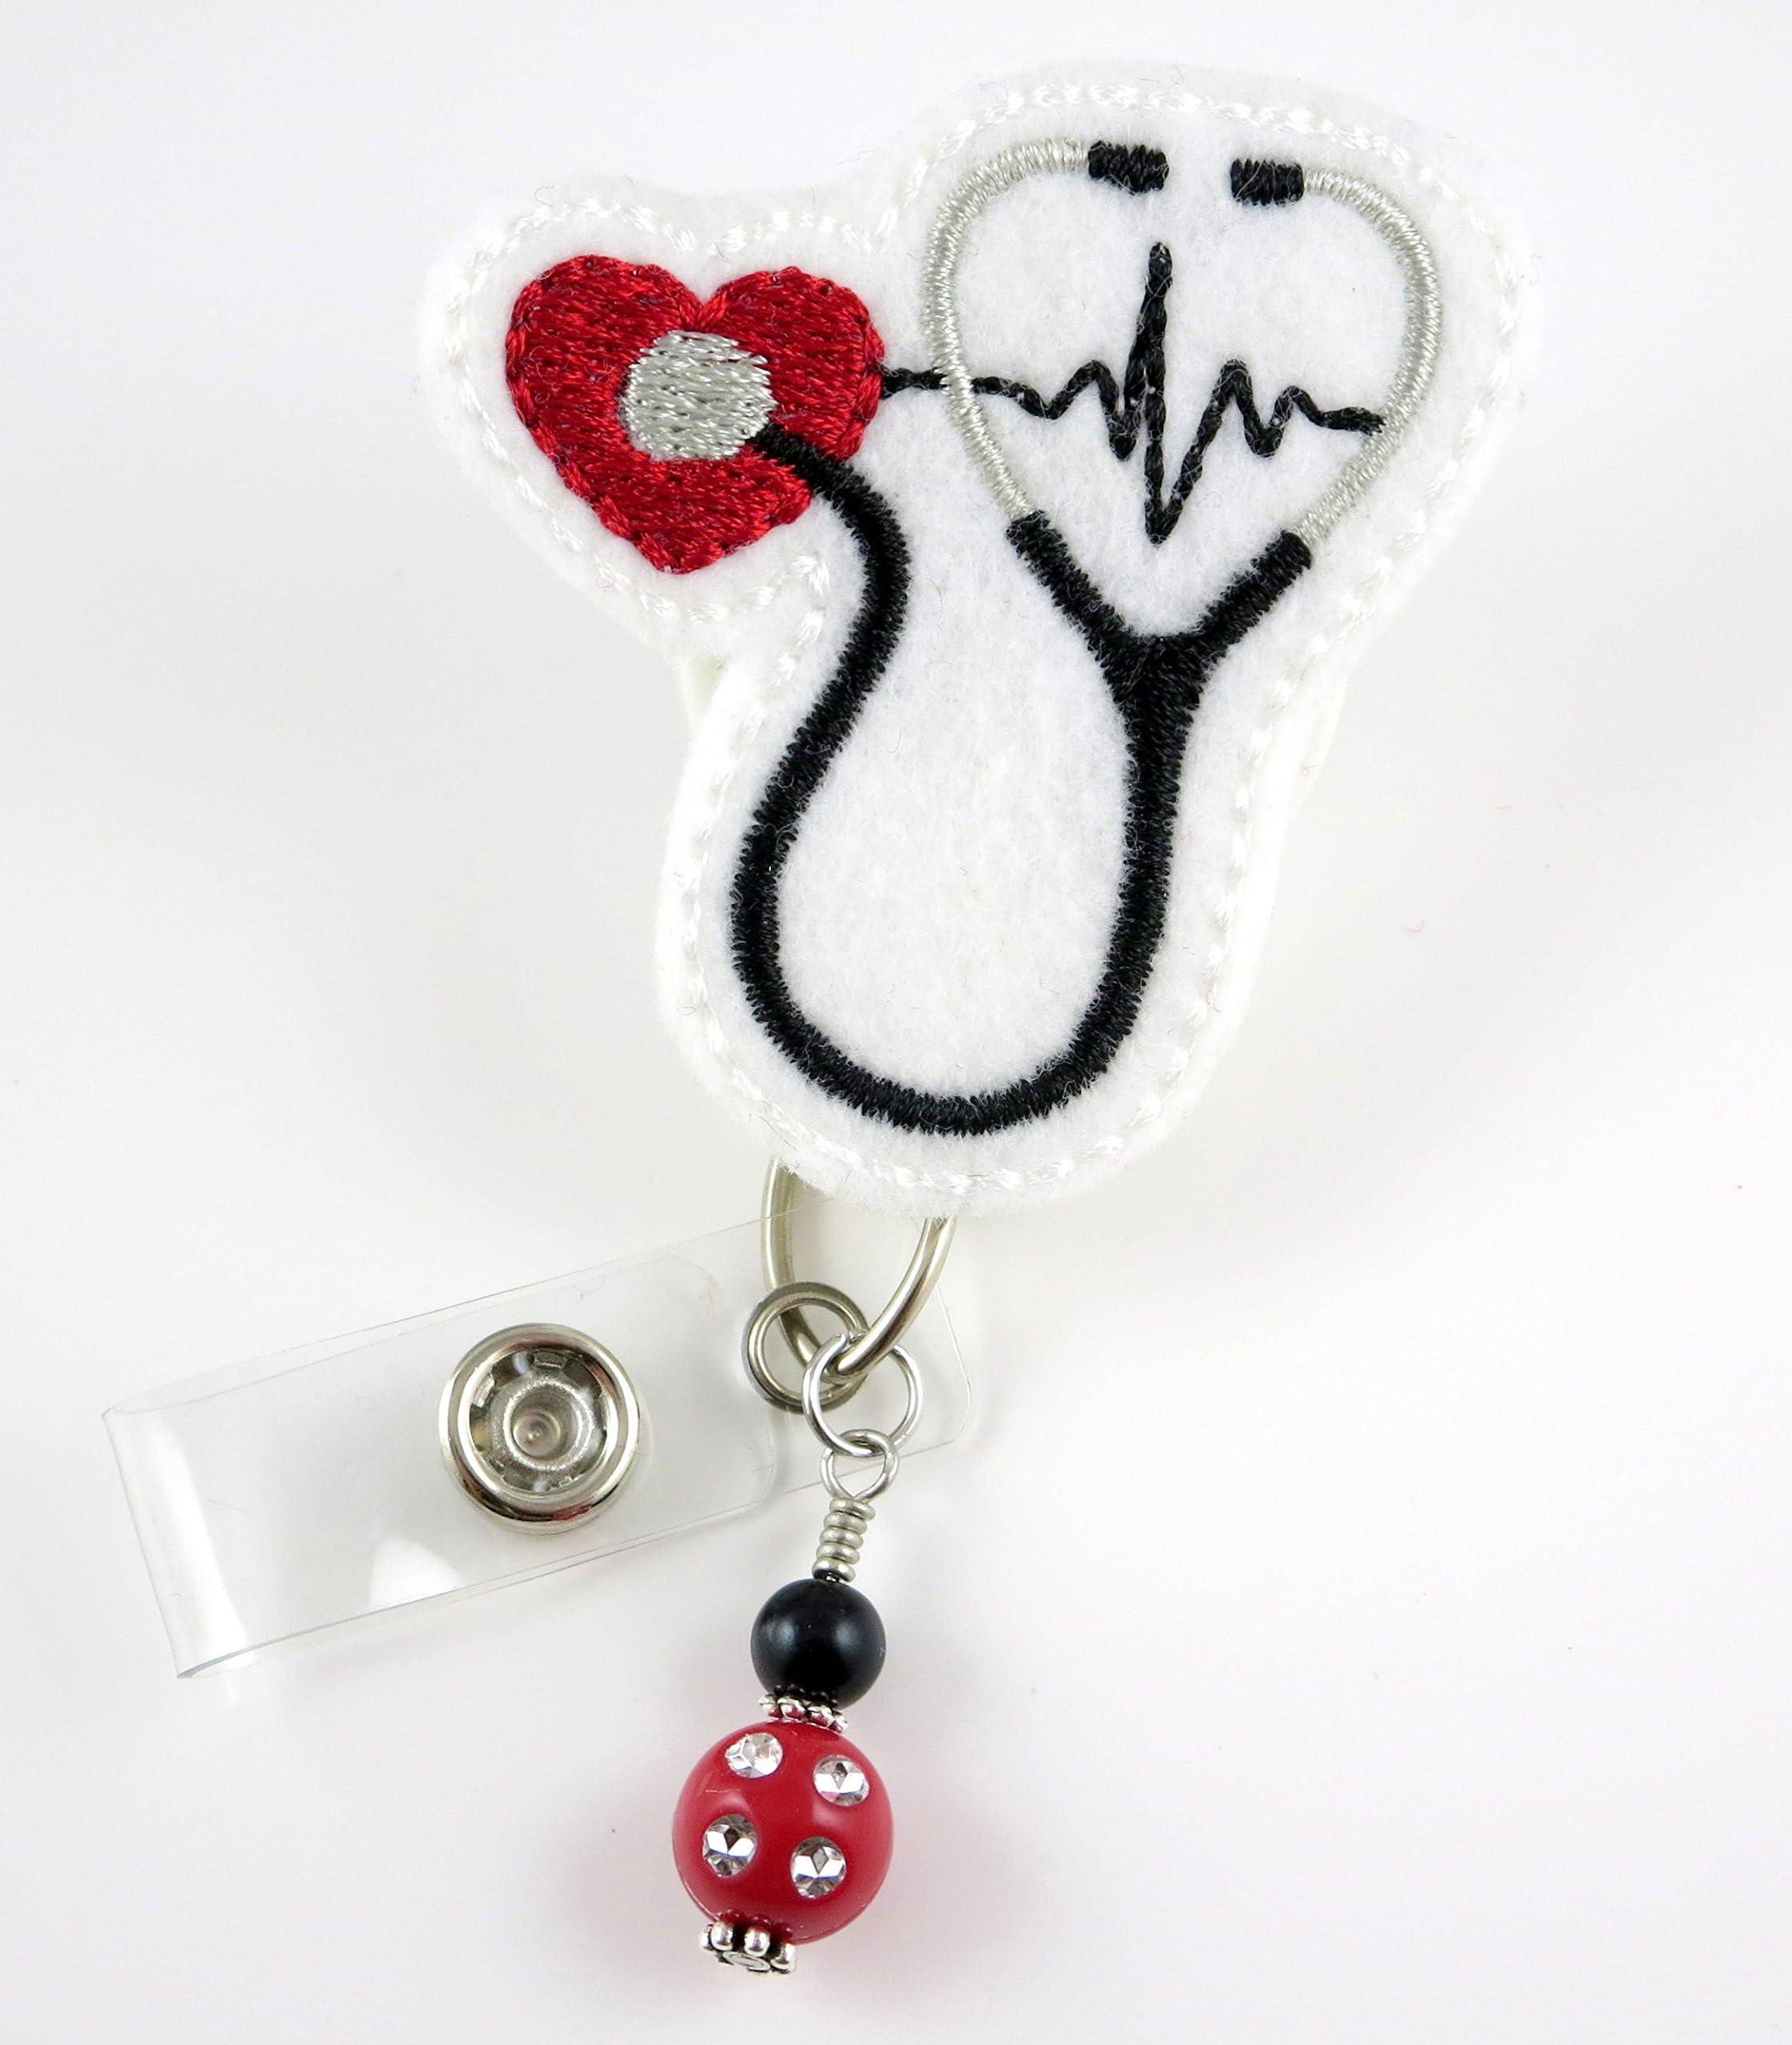 ID Badge Holder Nursing Student Gift Stethoscope Id Tag Carabiner Lanyard Badge Reel Little Mermaid Retractable Badge Holder